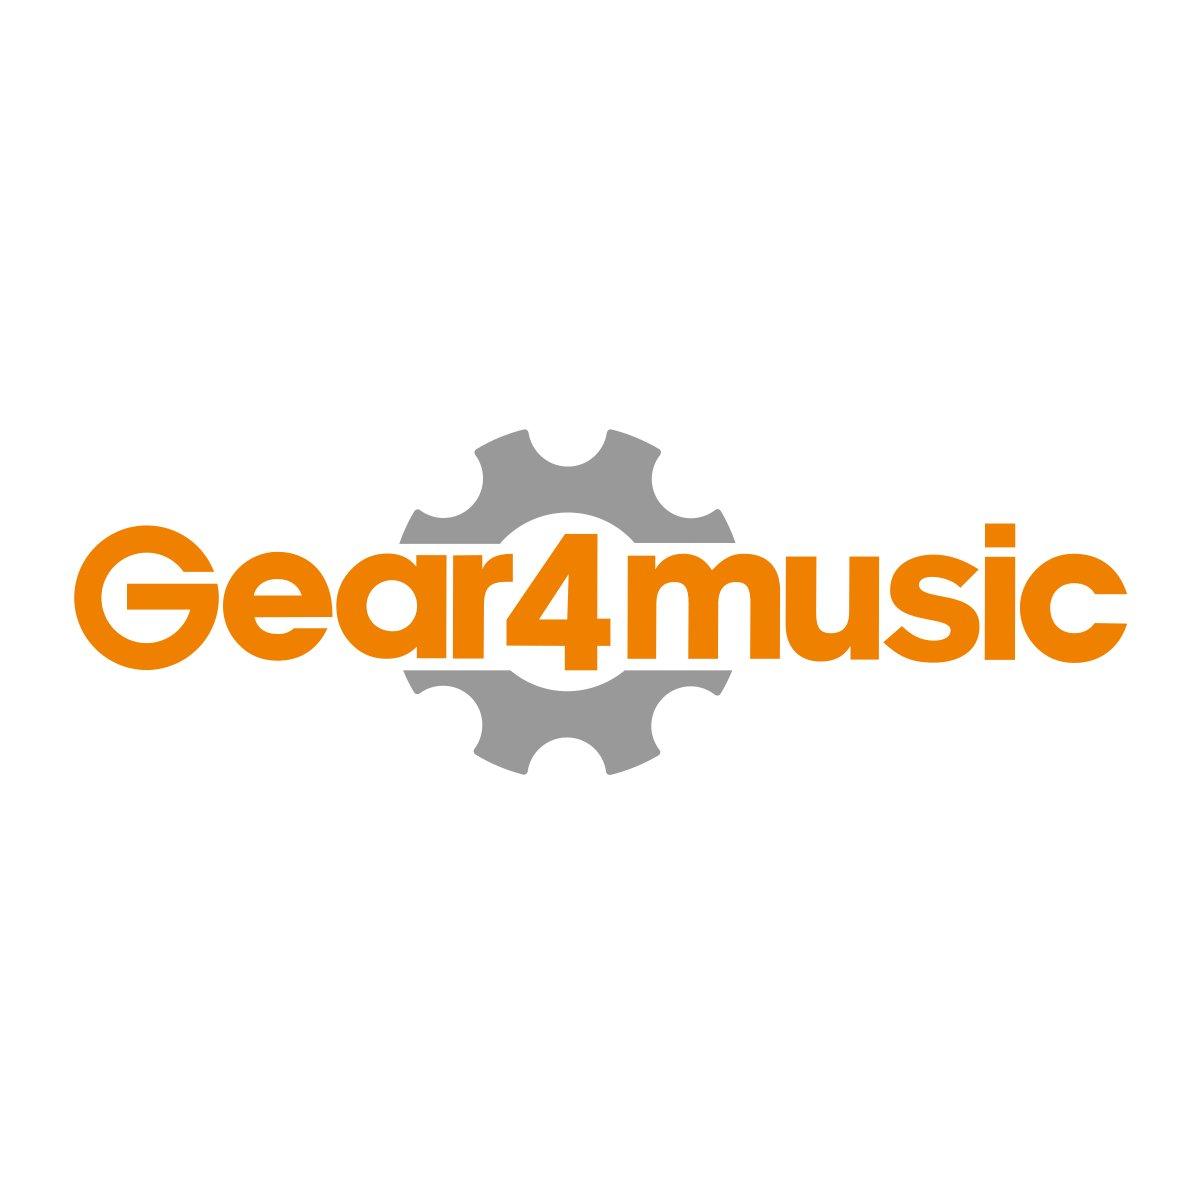 E-Gitarren | Gitarren-Shop | Gear4music